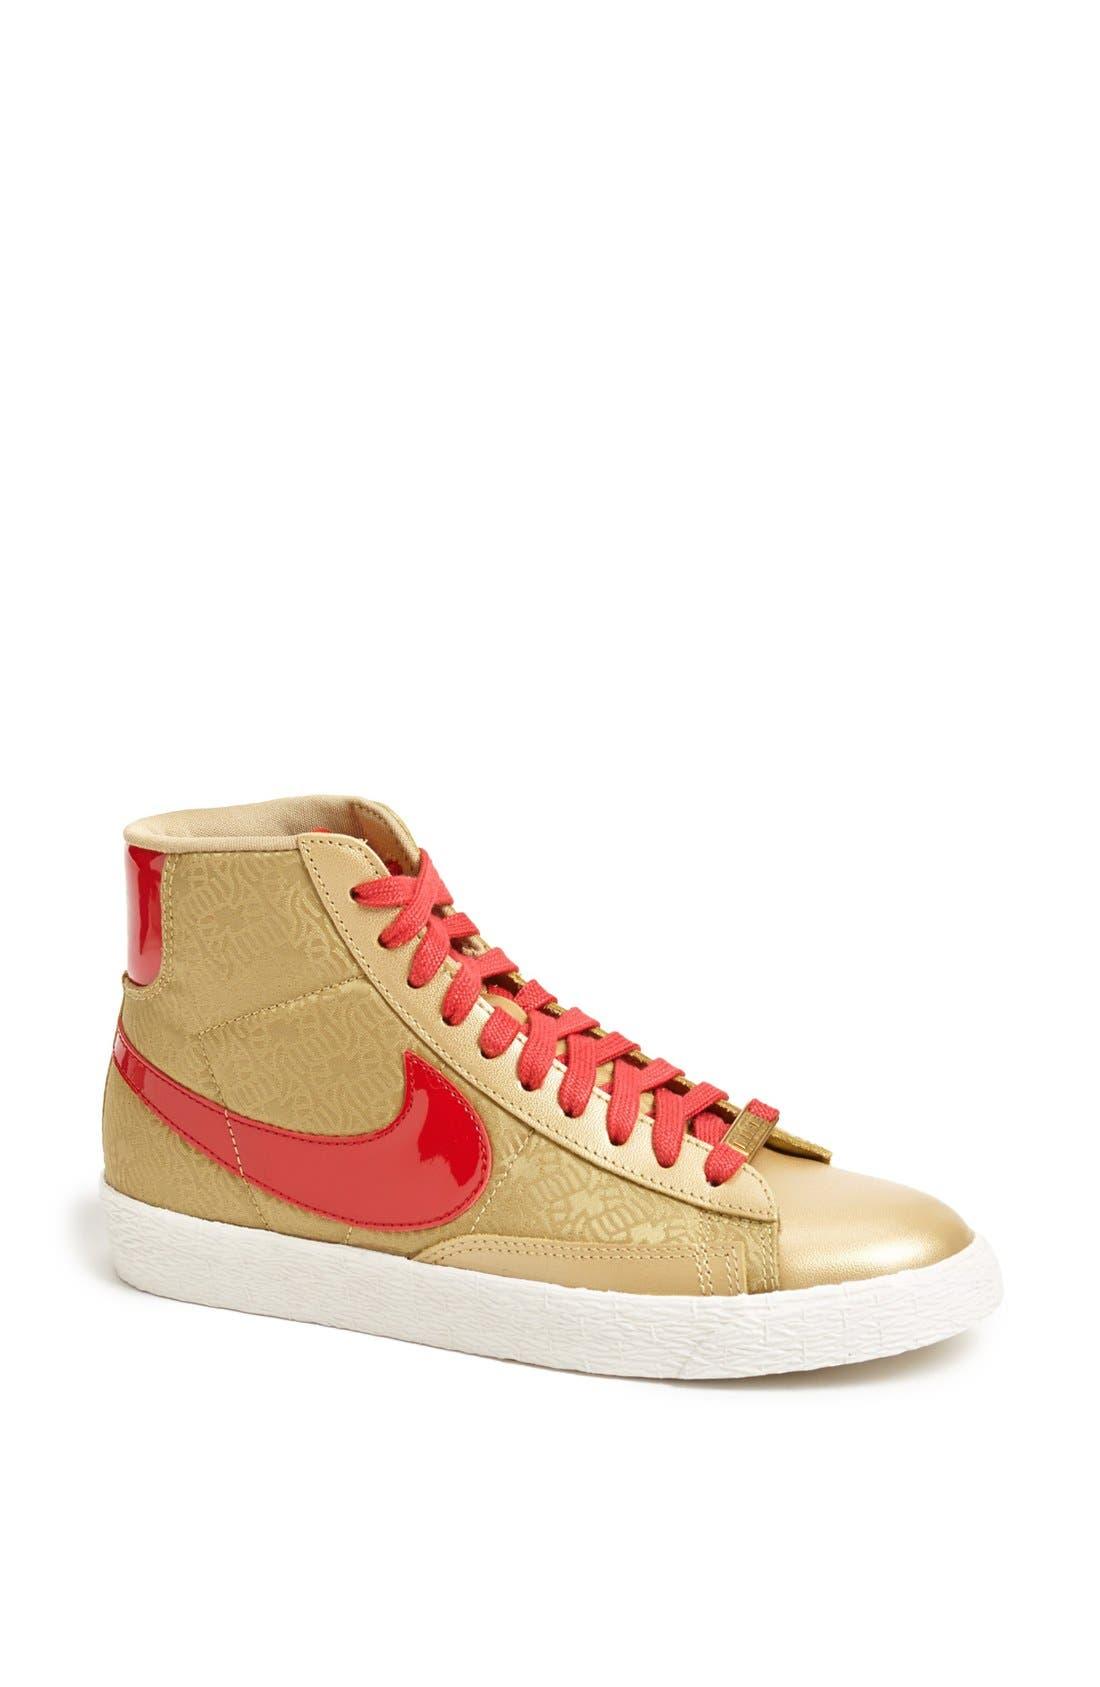 Main Image - Nike 'Blazer Mid - Year of the Horse' Sneaker (Women)